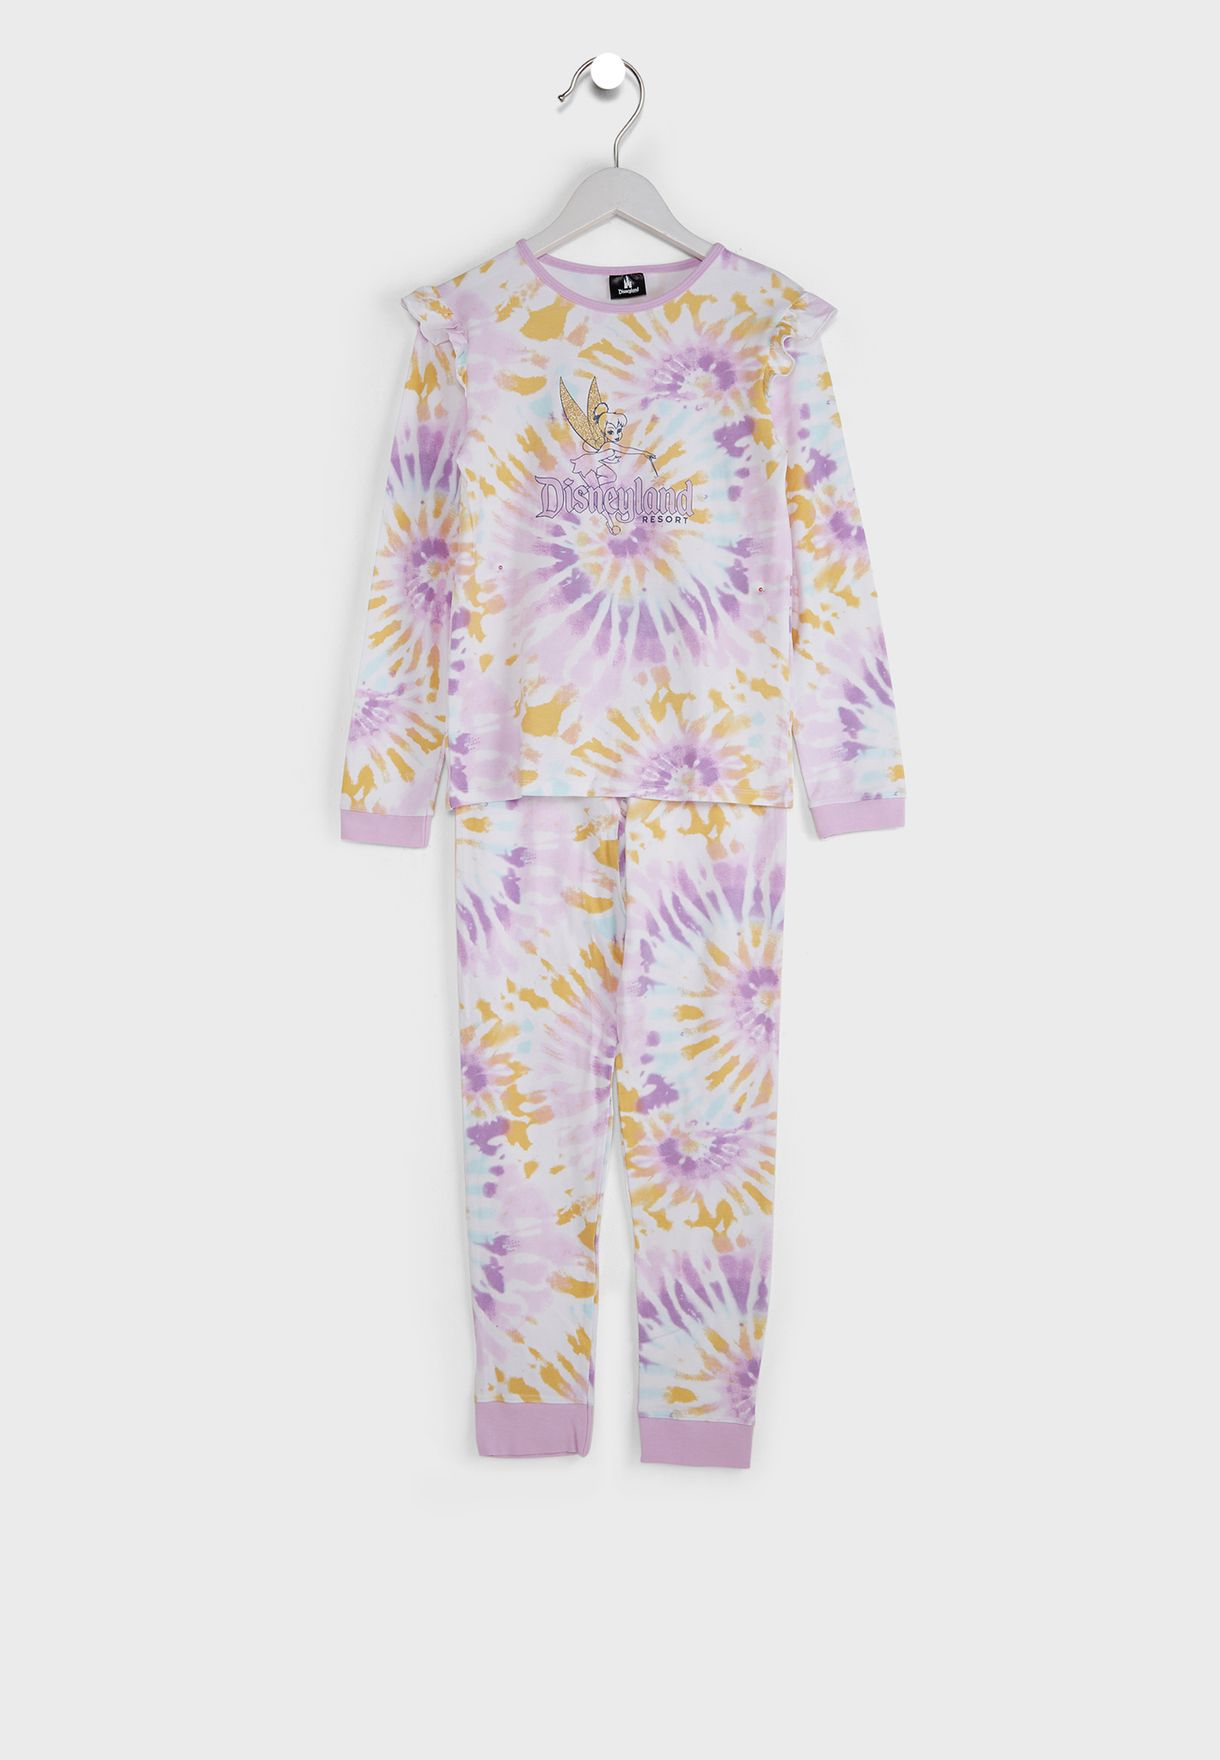 Kids Disneyland Rainbow Tinkerbell Pyjama Set